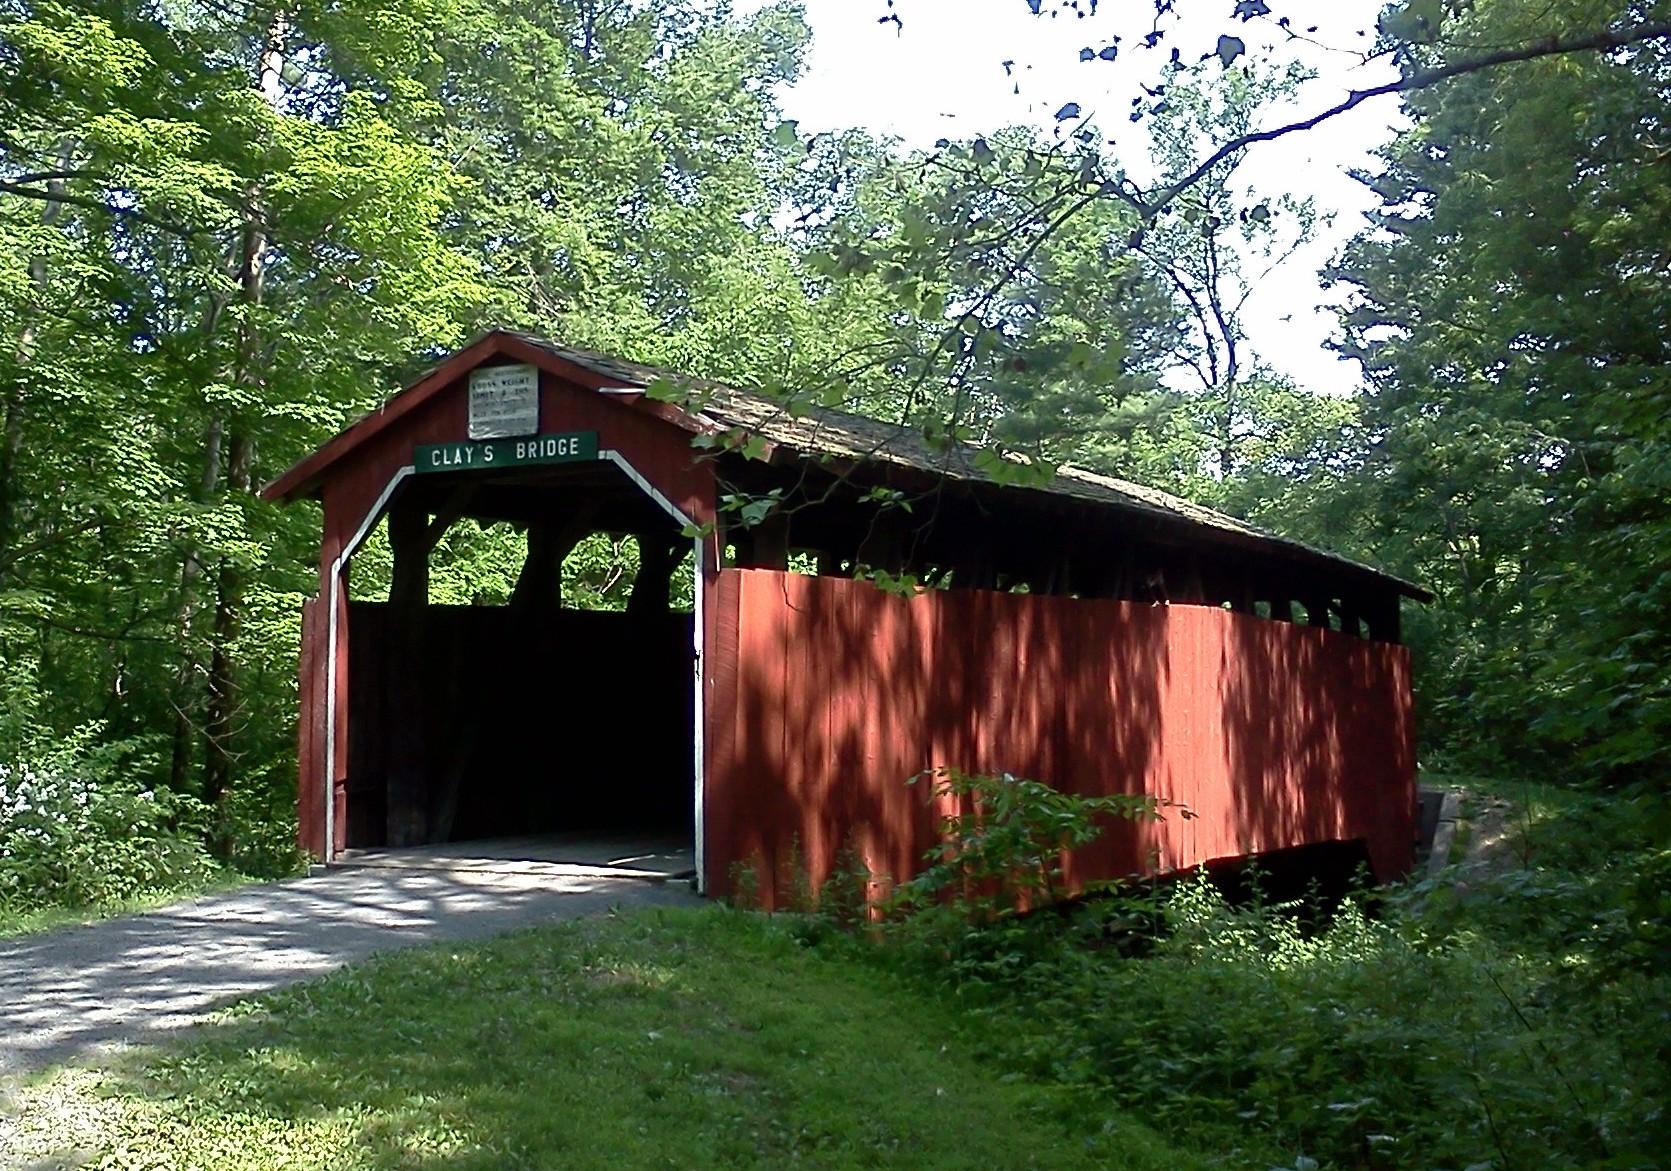 Clay's Bridge can be found nearl Holman Lake in Little Buffalo State Park, near Newport.